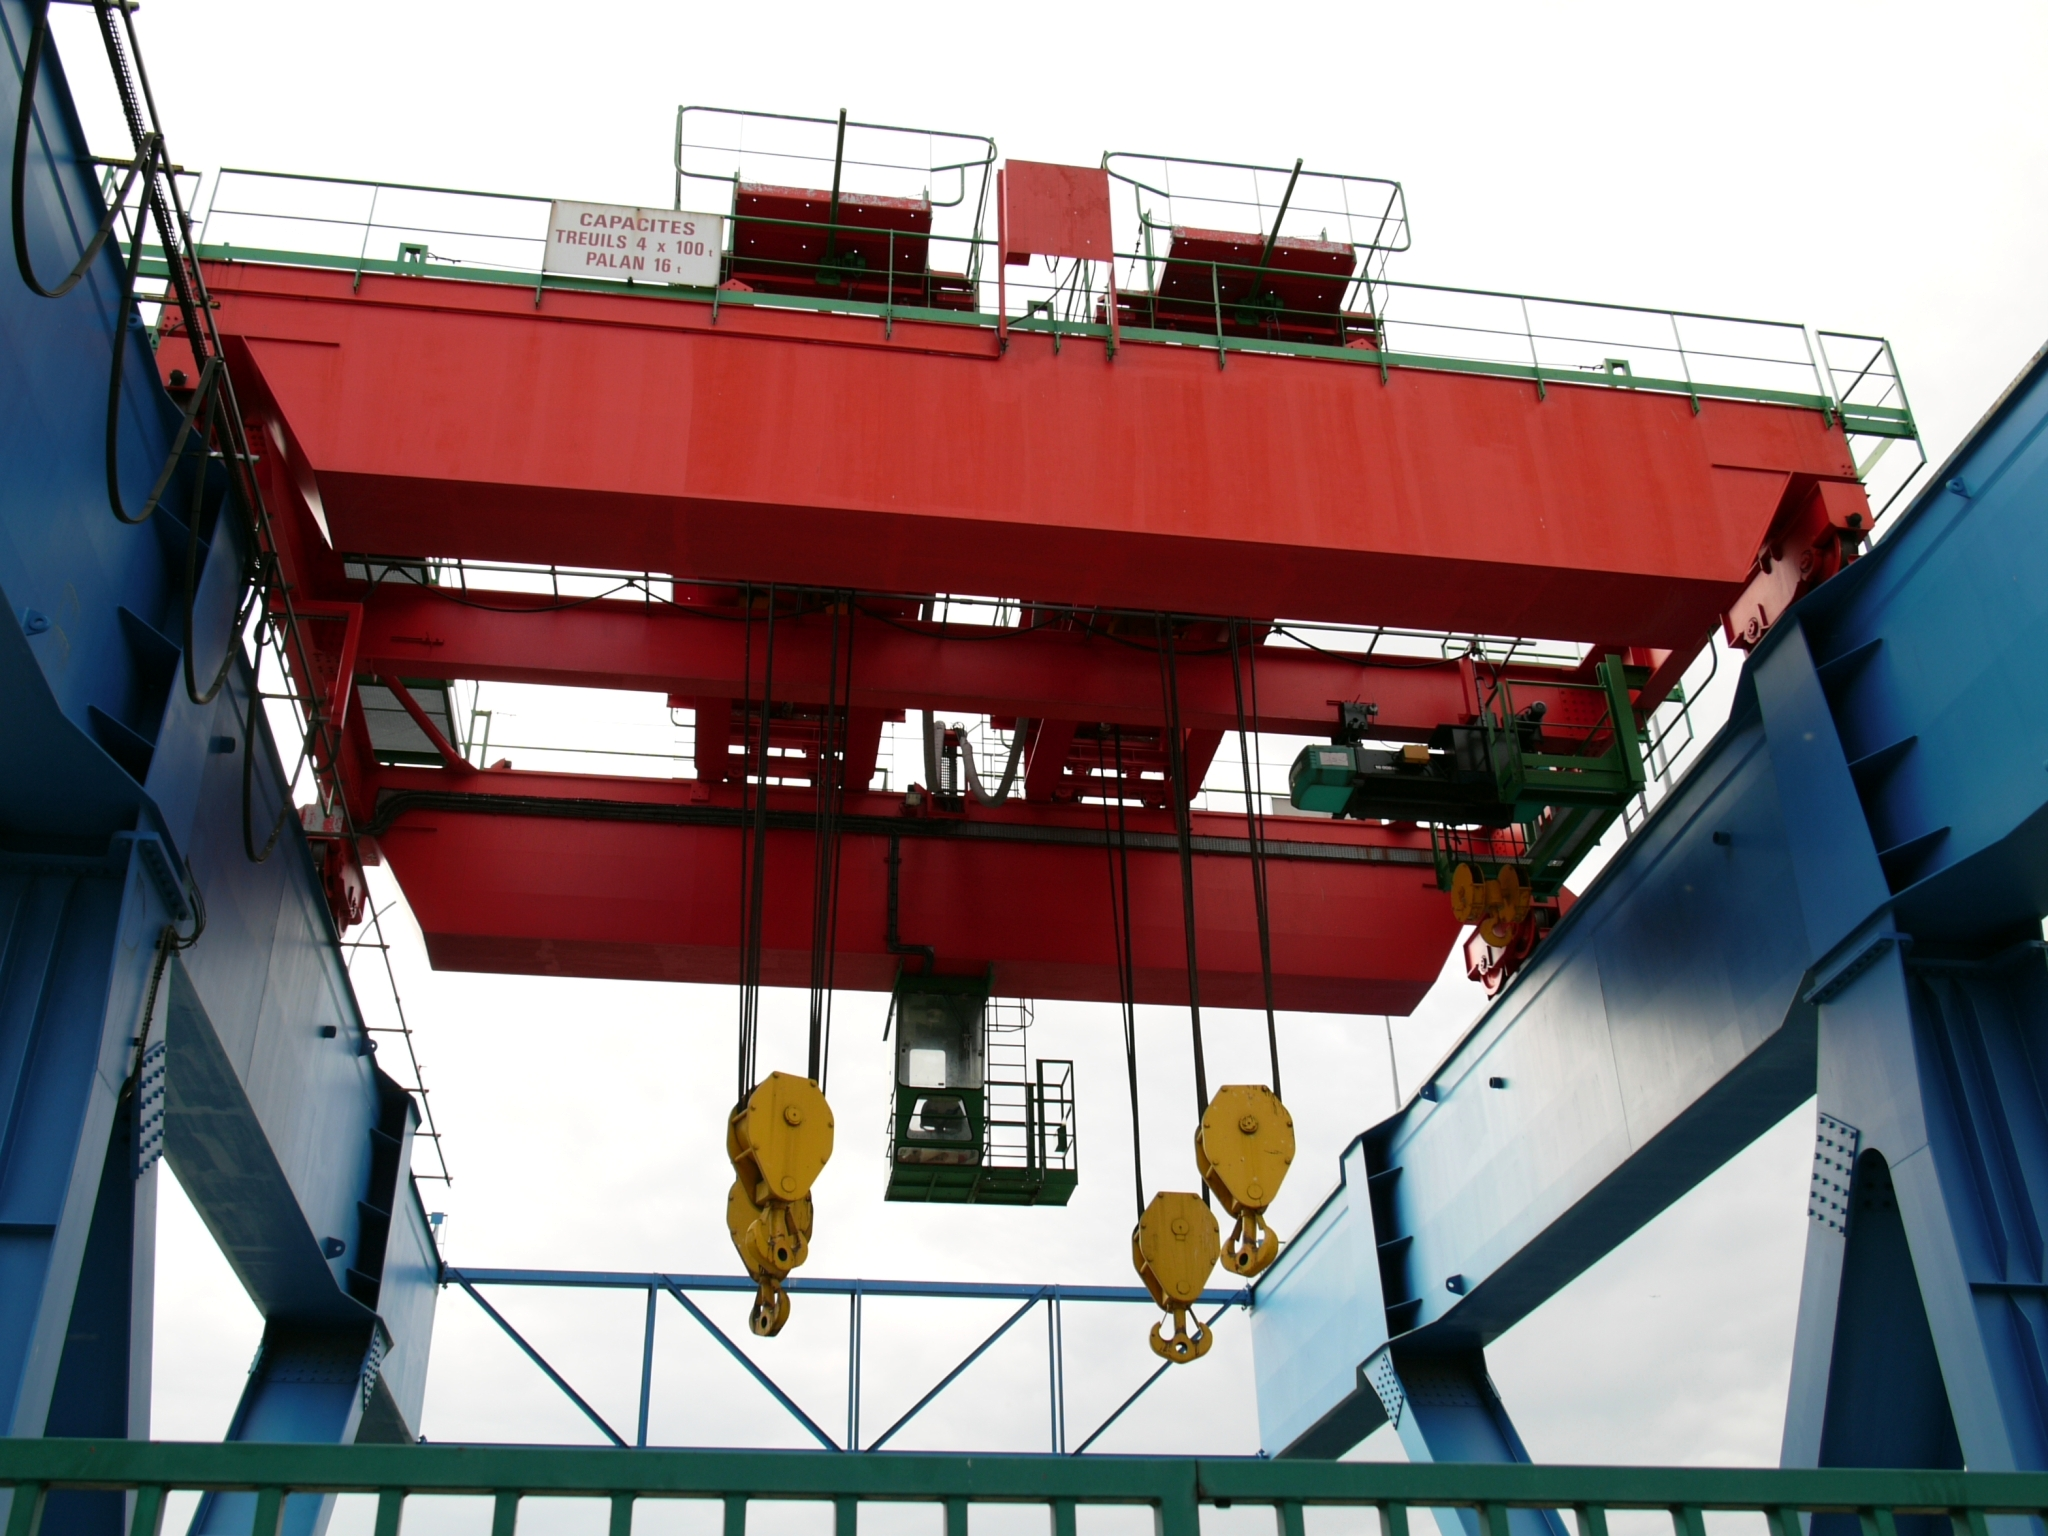 Over Head Cranes : File overhead crane g wikimedia commons